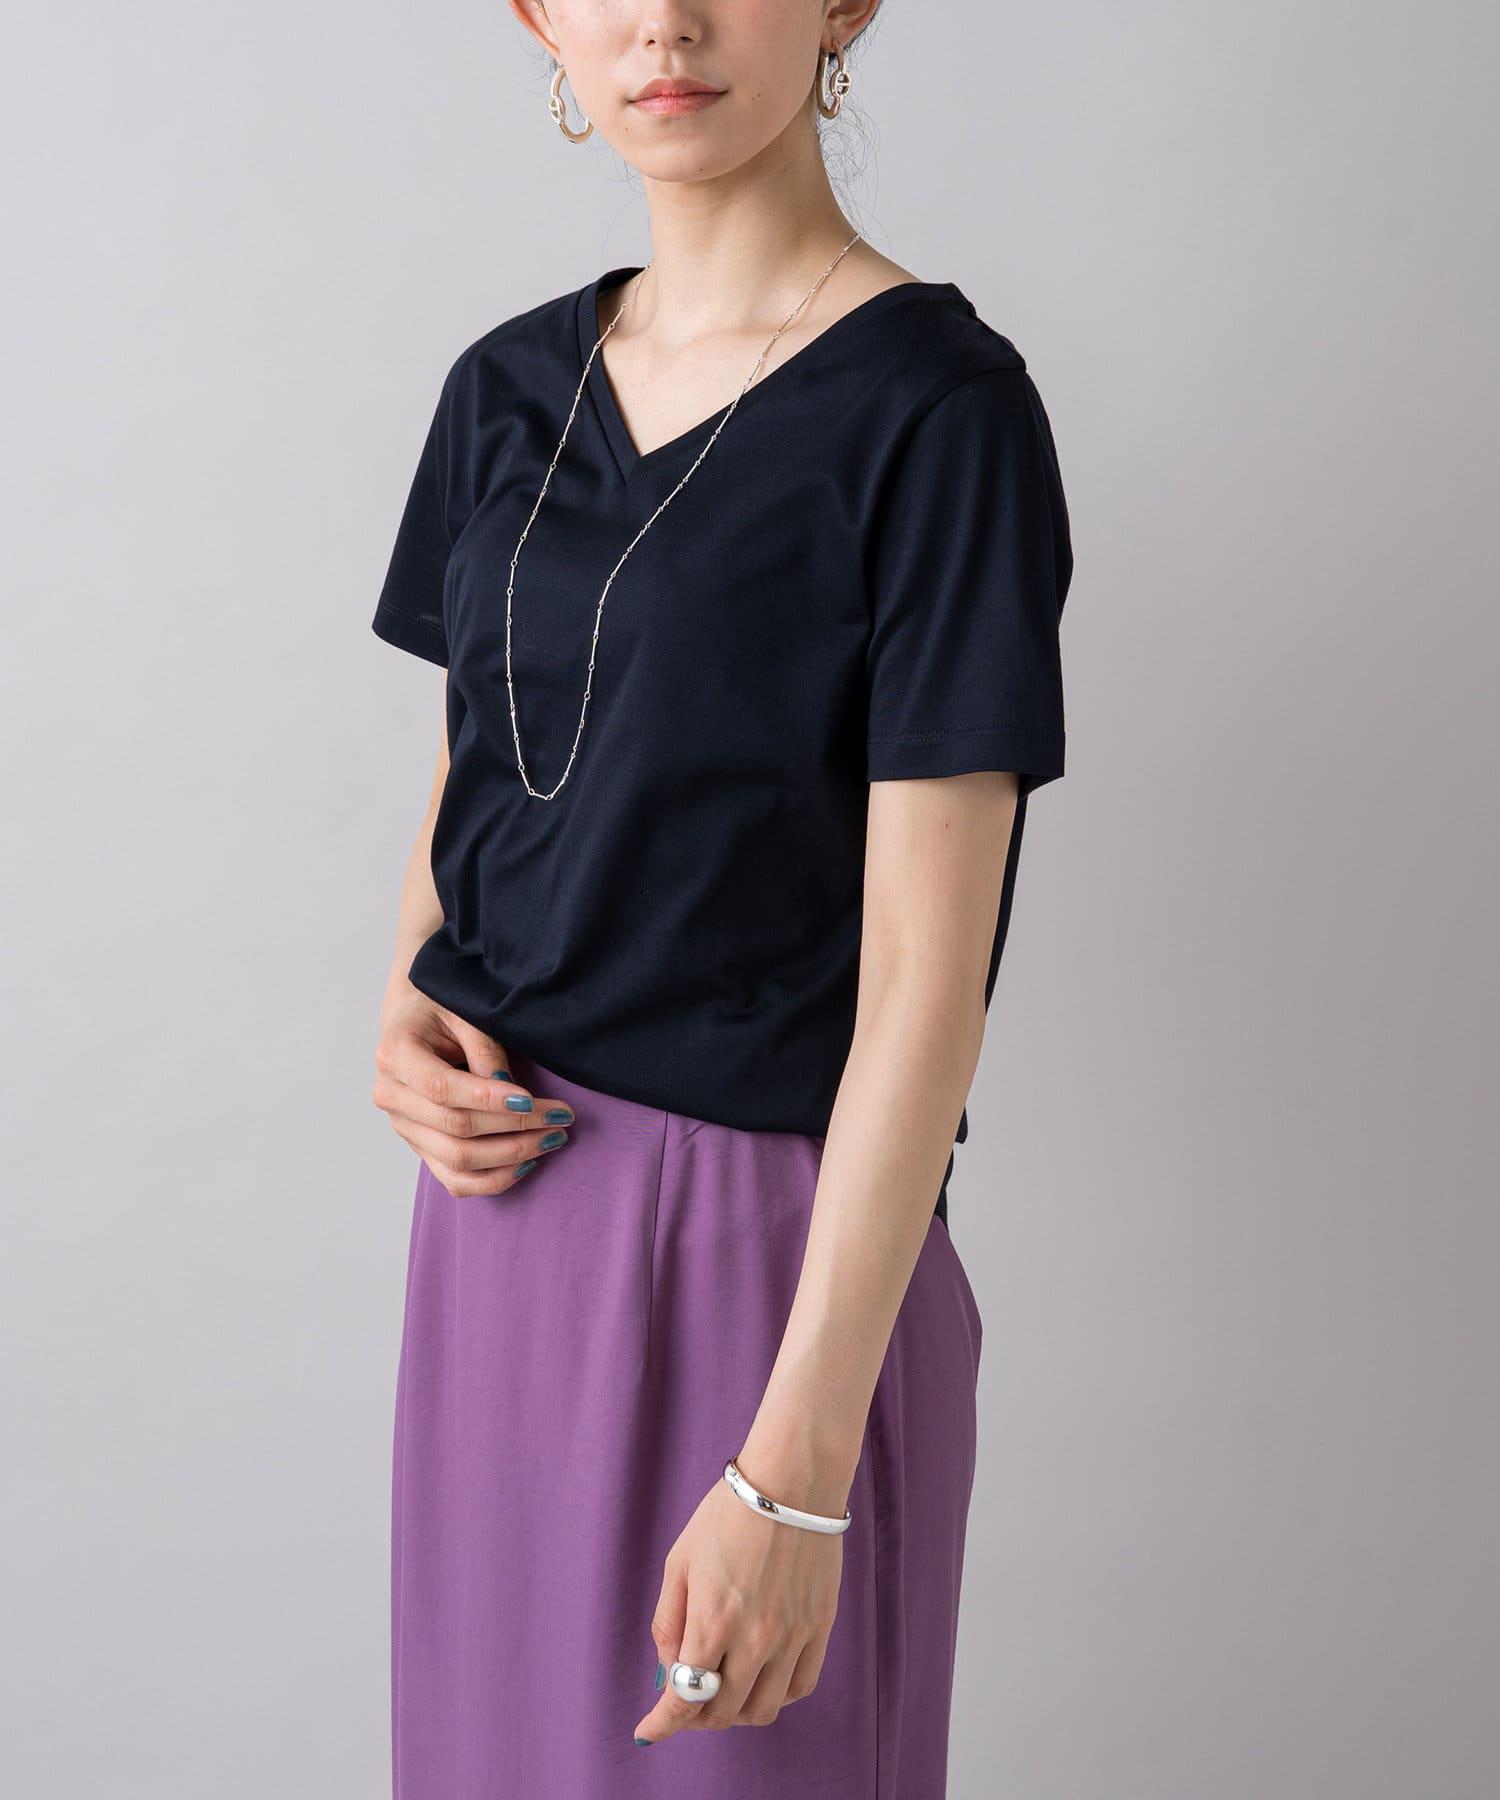 Loungedress(ラウンジドレス) シンプルVネックTシャツ